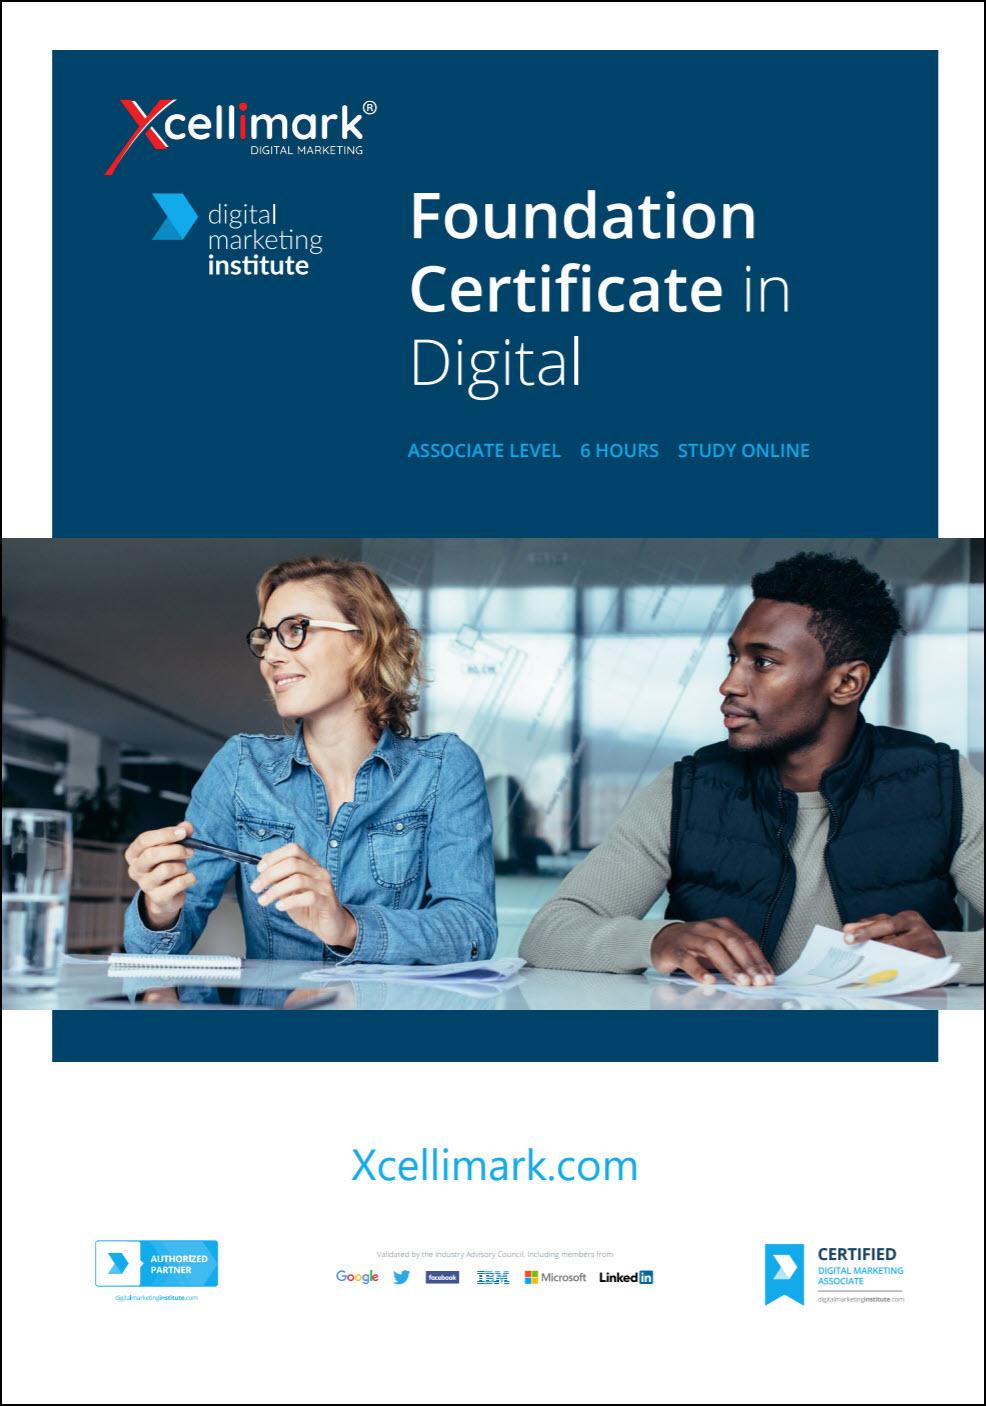 Foundation Certificate in Digital - Associate Level